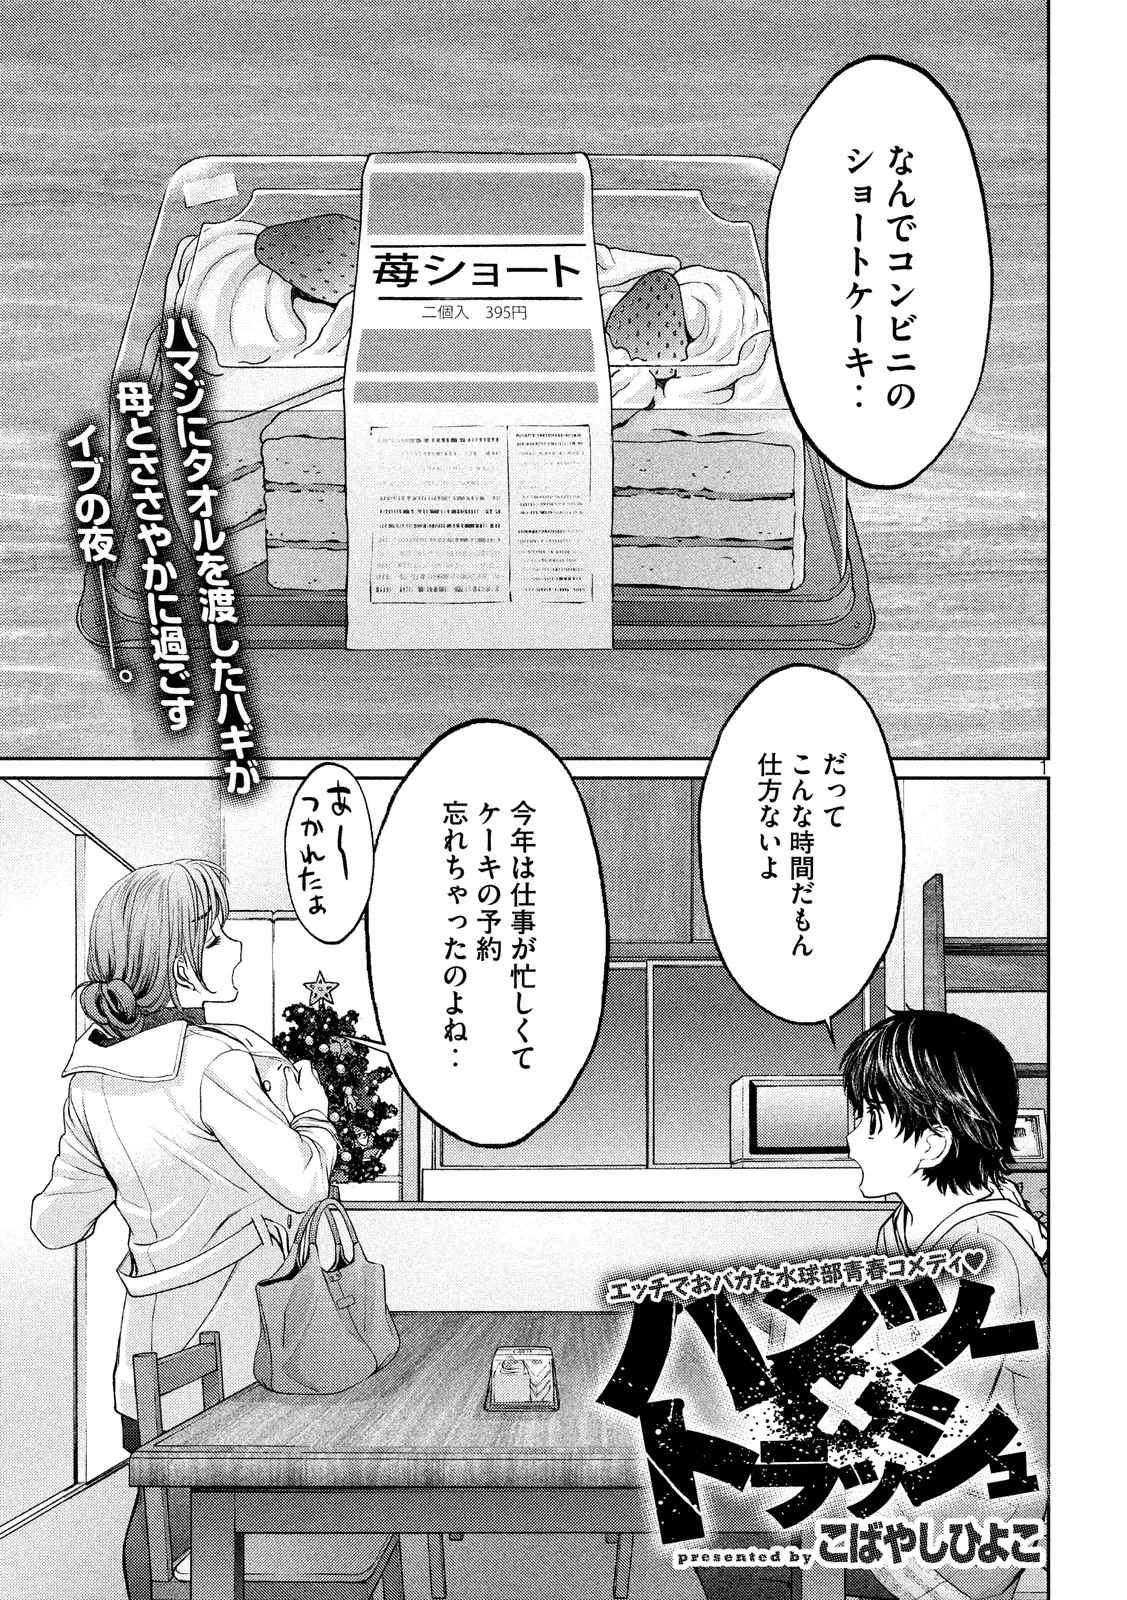 Hantsu x Trash - Chapter 132 - Page 1